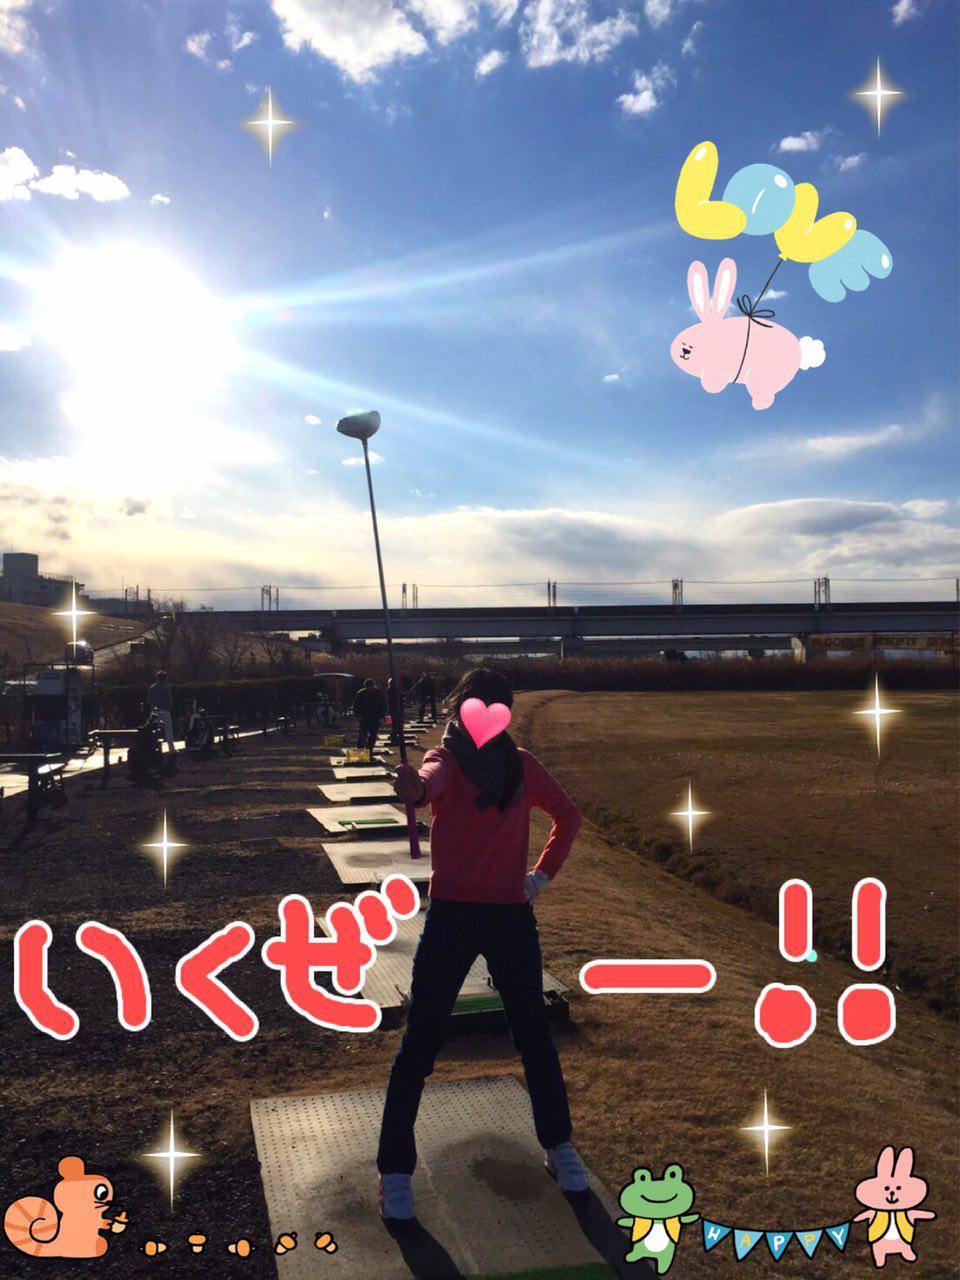 photo_2017-02-14_00-20-17.jpg